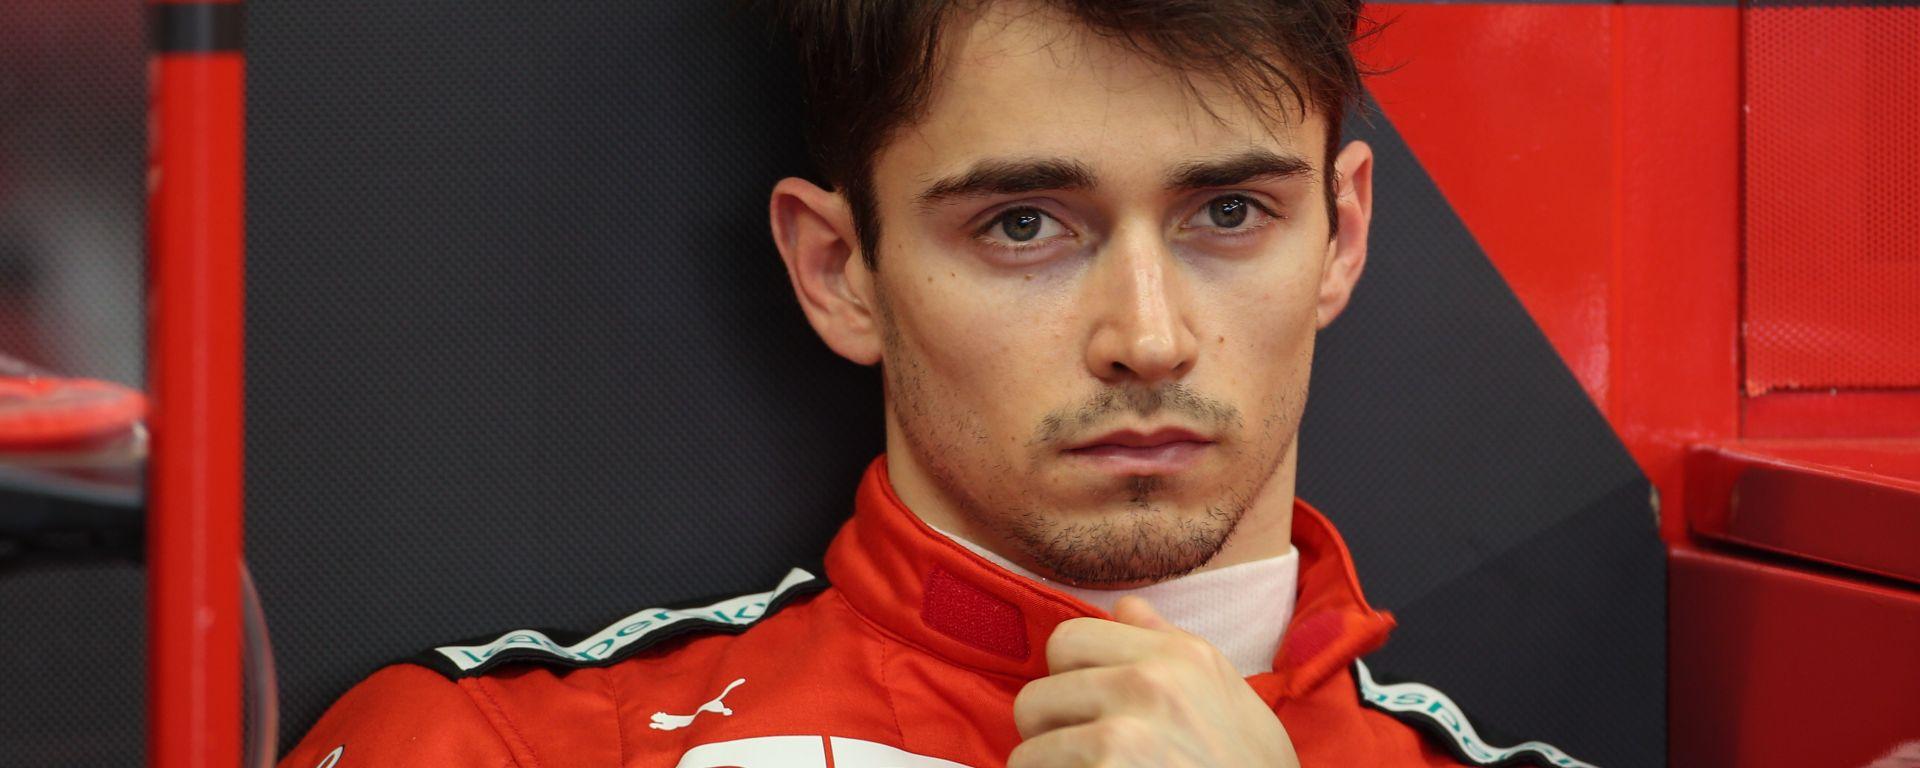 F1 2020: Charles Leclerc (Ferrari)